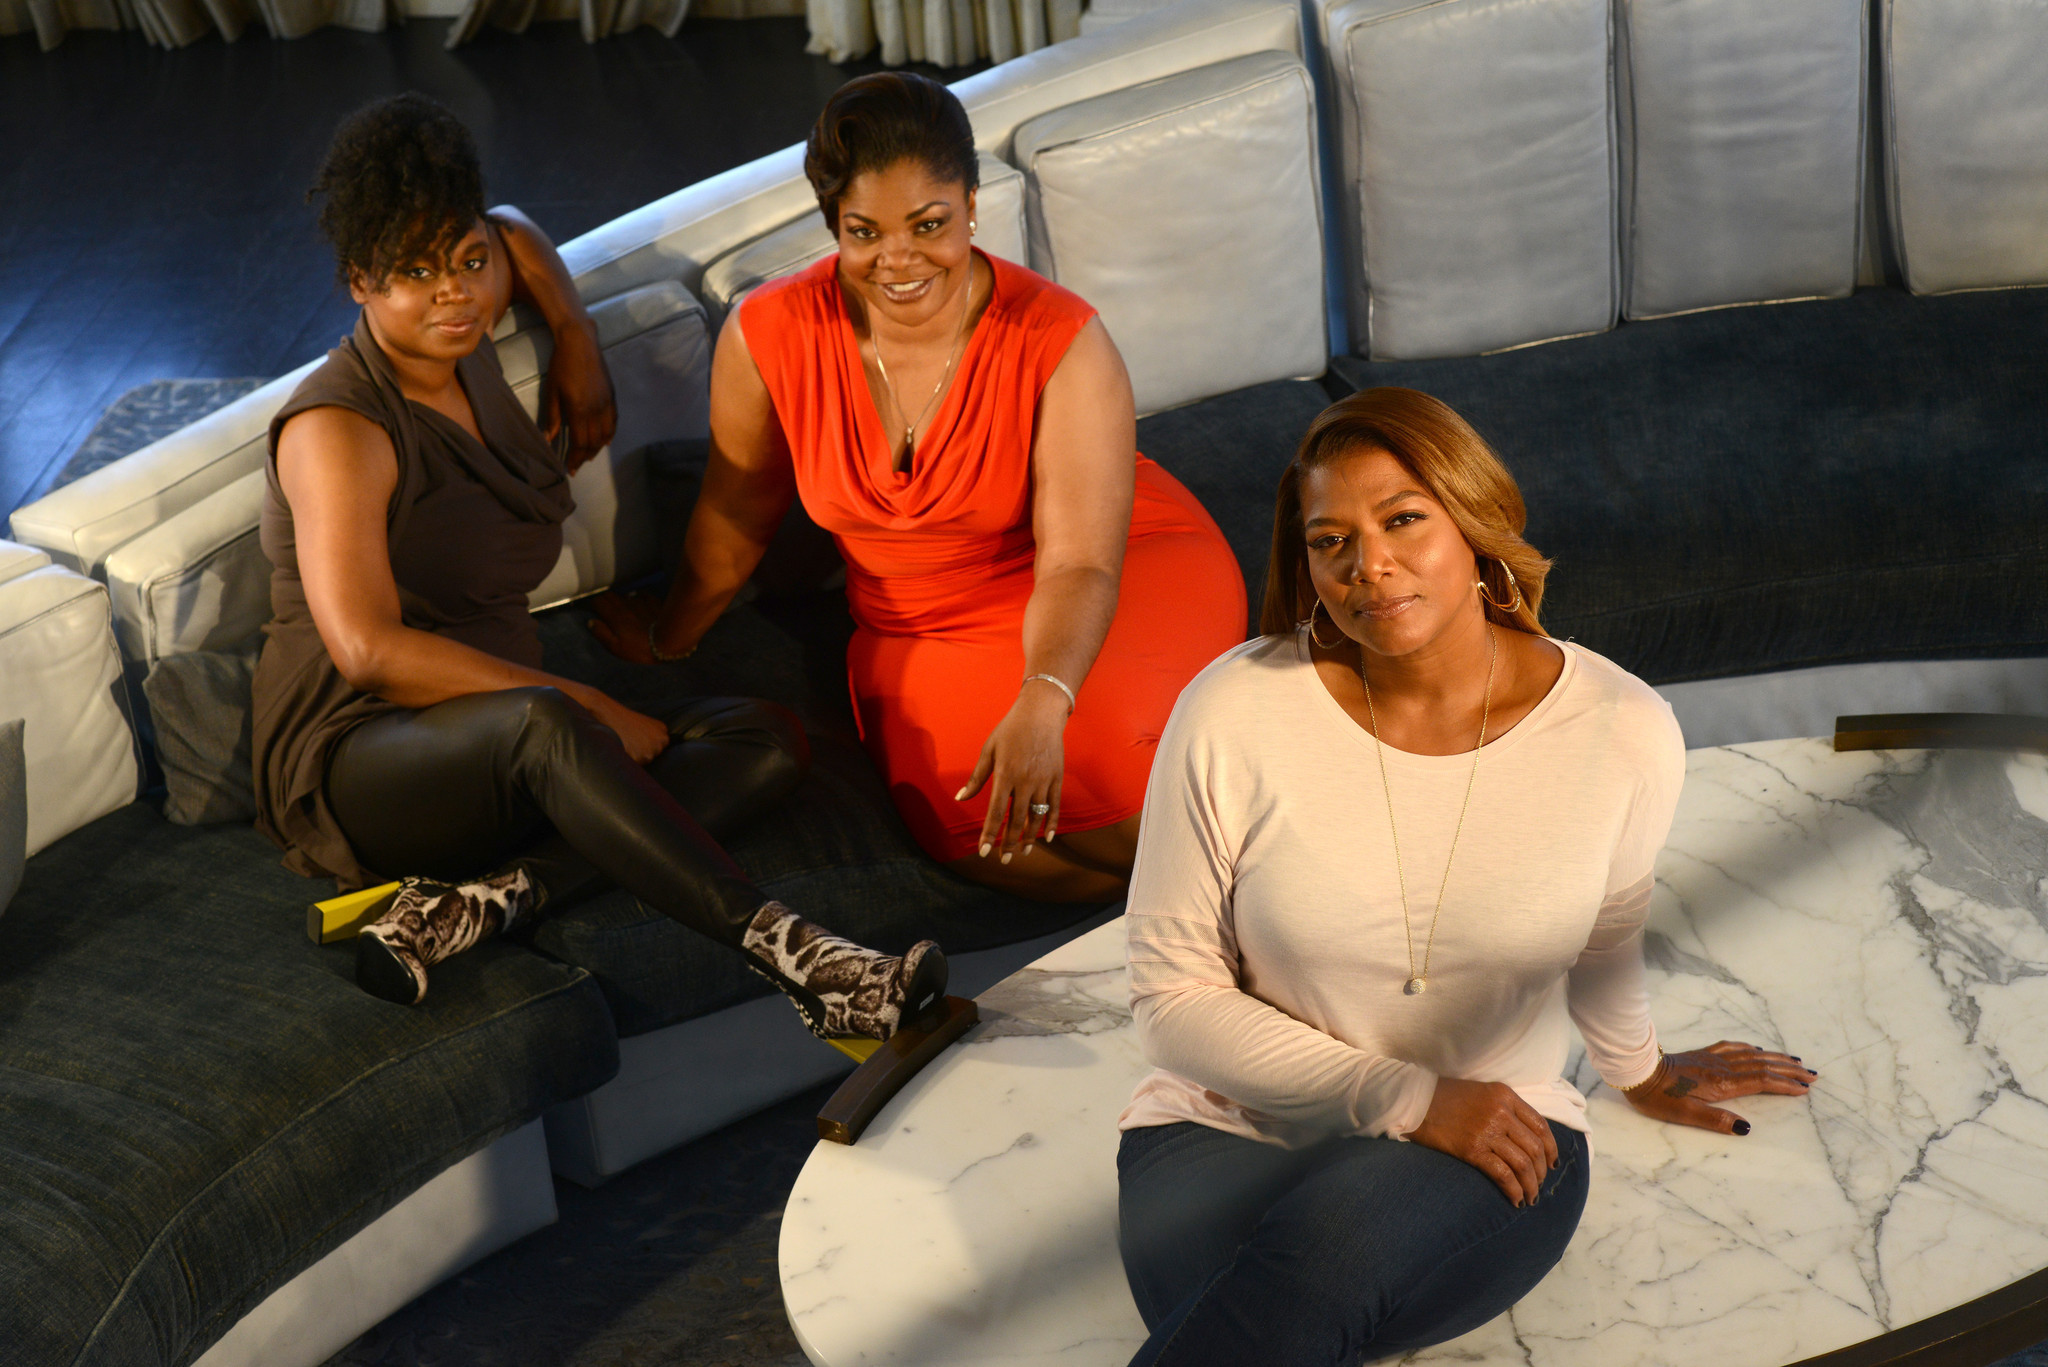 Tremendous Queen Latifah Monique And Dee Rees On Making Hbos Bessie Short Hairstyles Gunalazisus